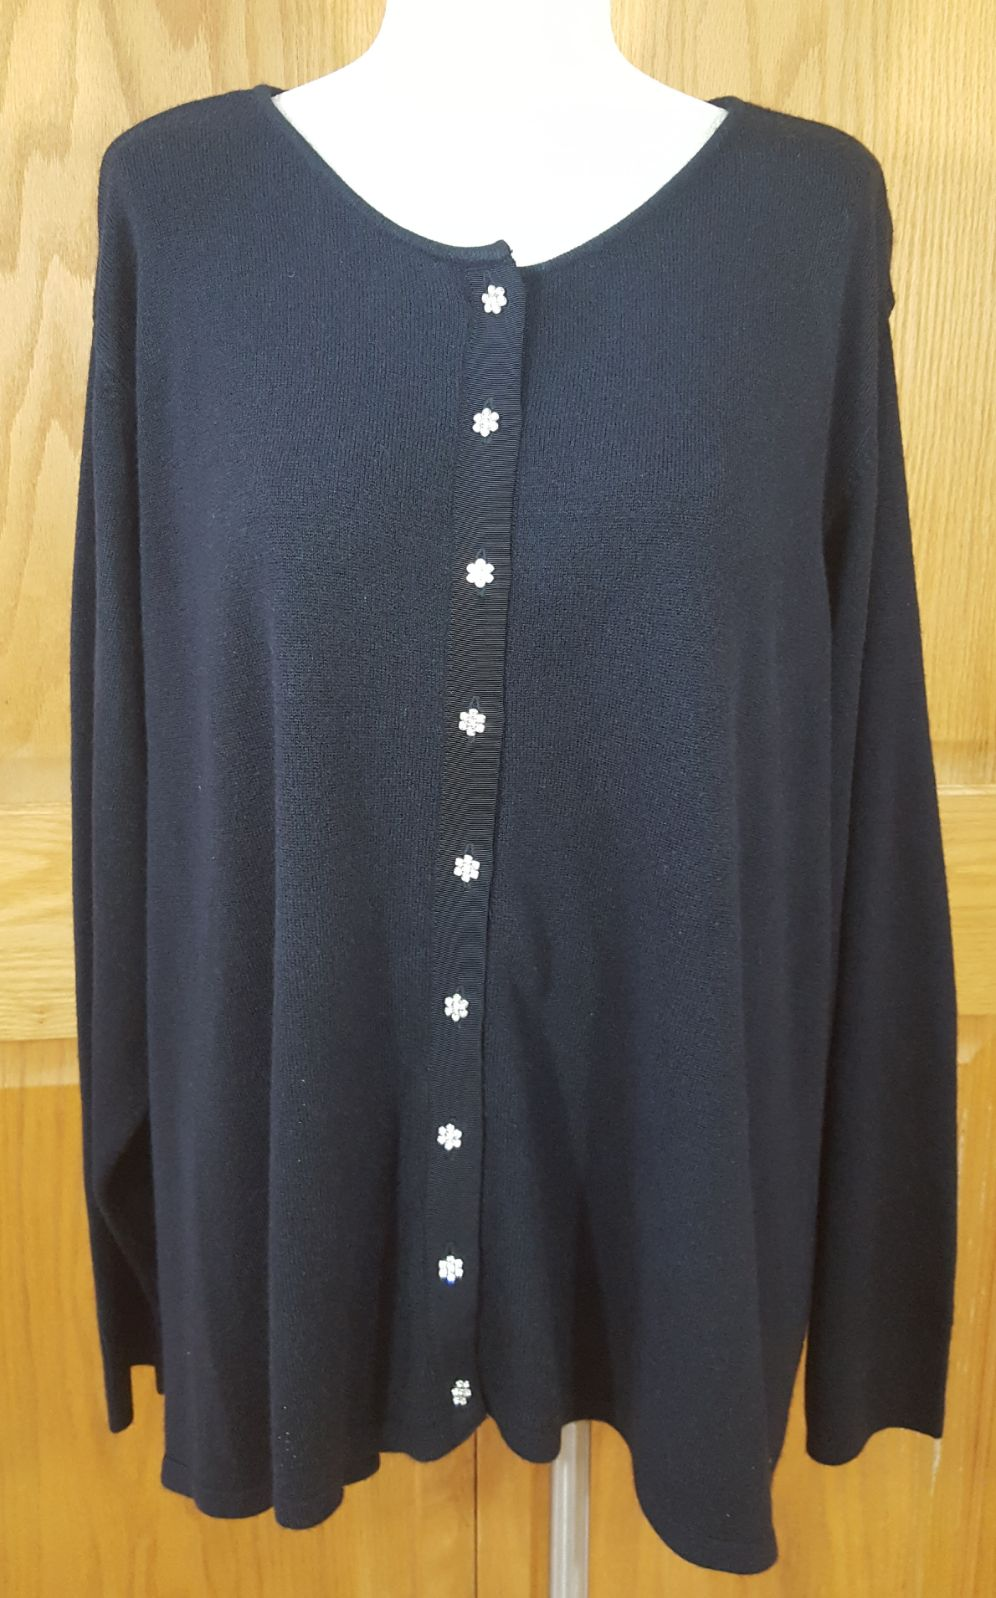 Avenue Black Cardigan Size 26 - 28 - Mercari: BUY & SELL THINGS ...